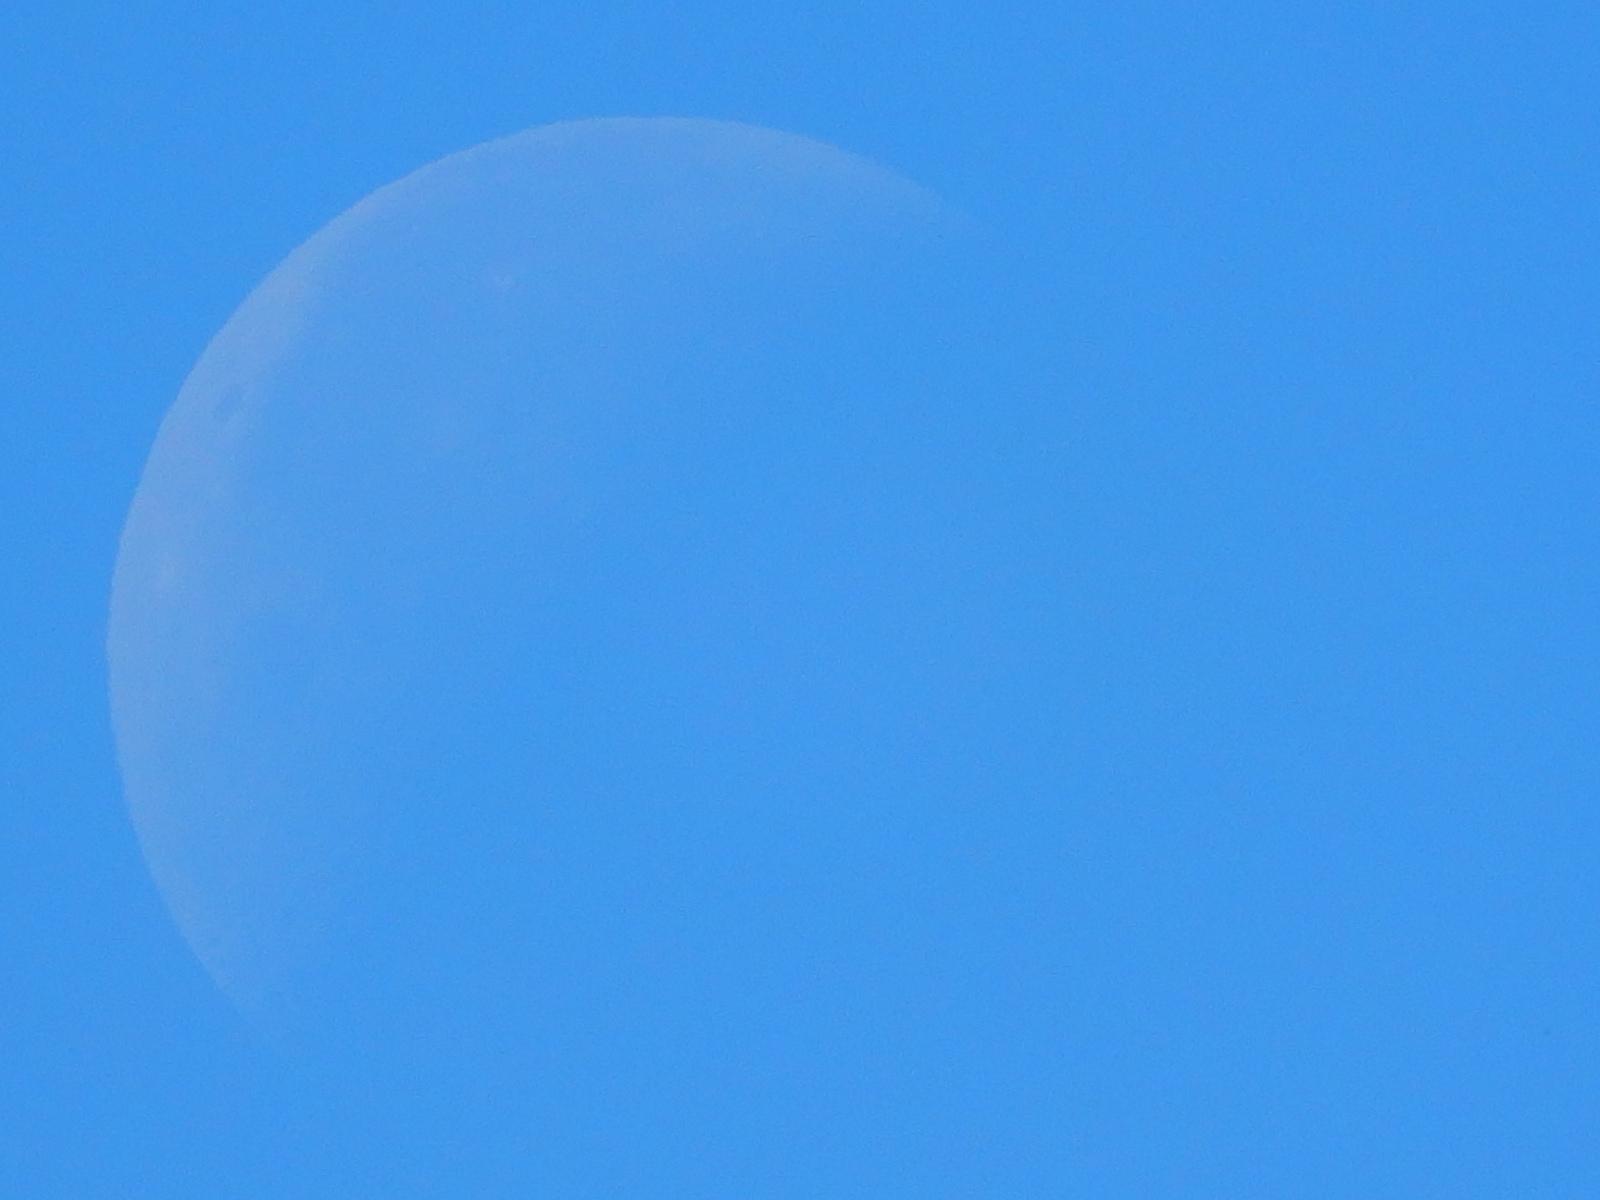 NikonクールピクスA900 昼間の月